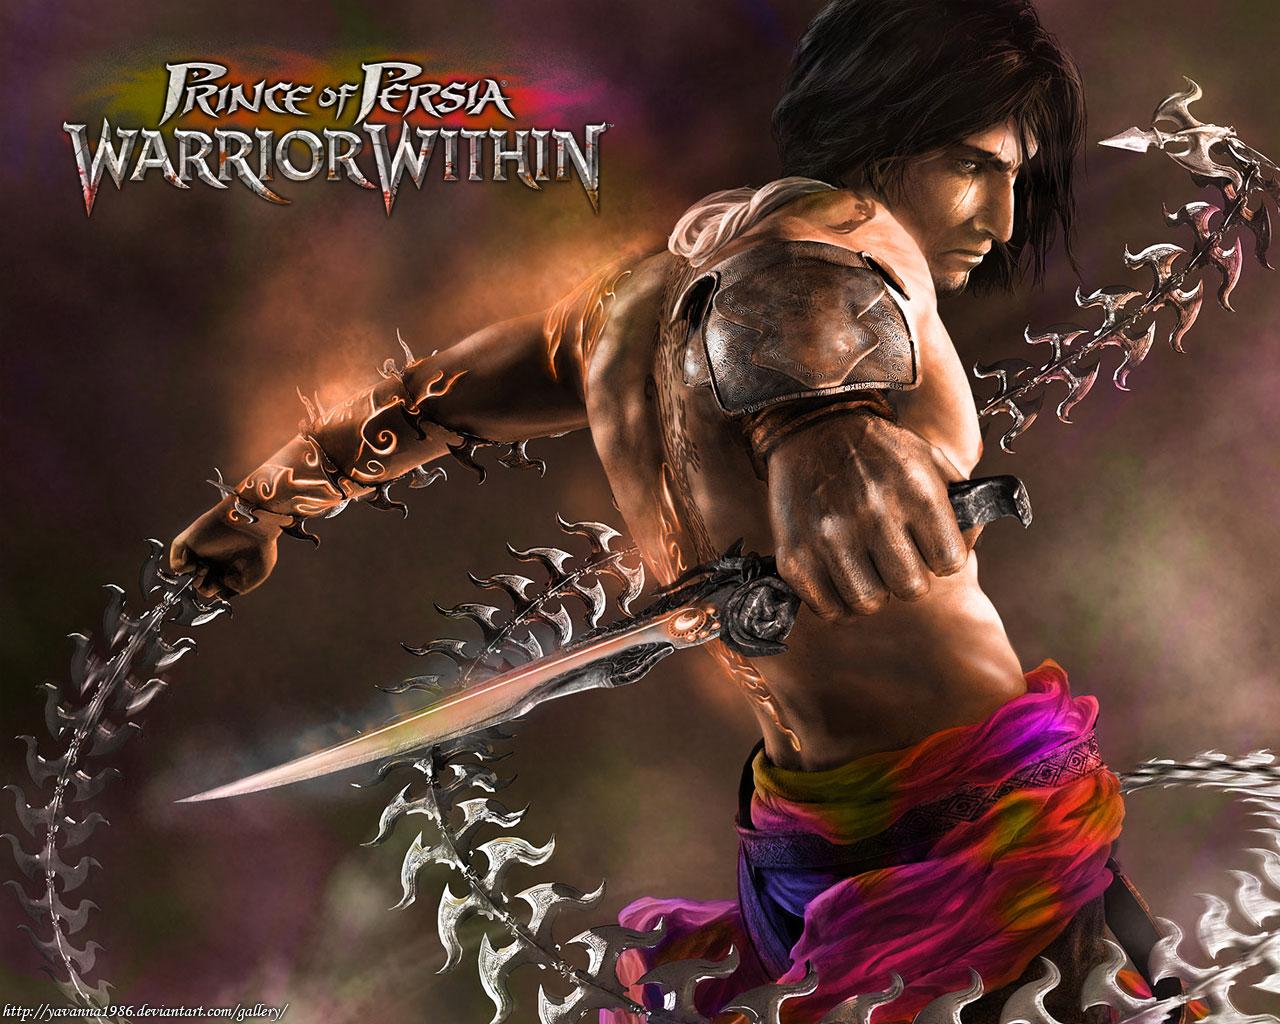 http://3.bp.blogspot.com/_DNNkclLtI0I/TDhEBdZrxWI/AAAAAAAAAGQ/IBRkkW7BxUw/s1600/Prince_of_Persia___Wallpaper_by_yavanna1986.jpg